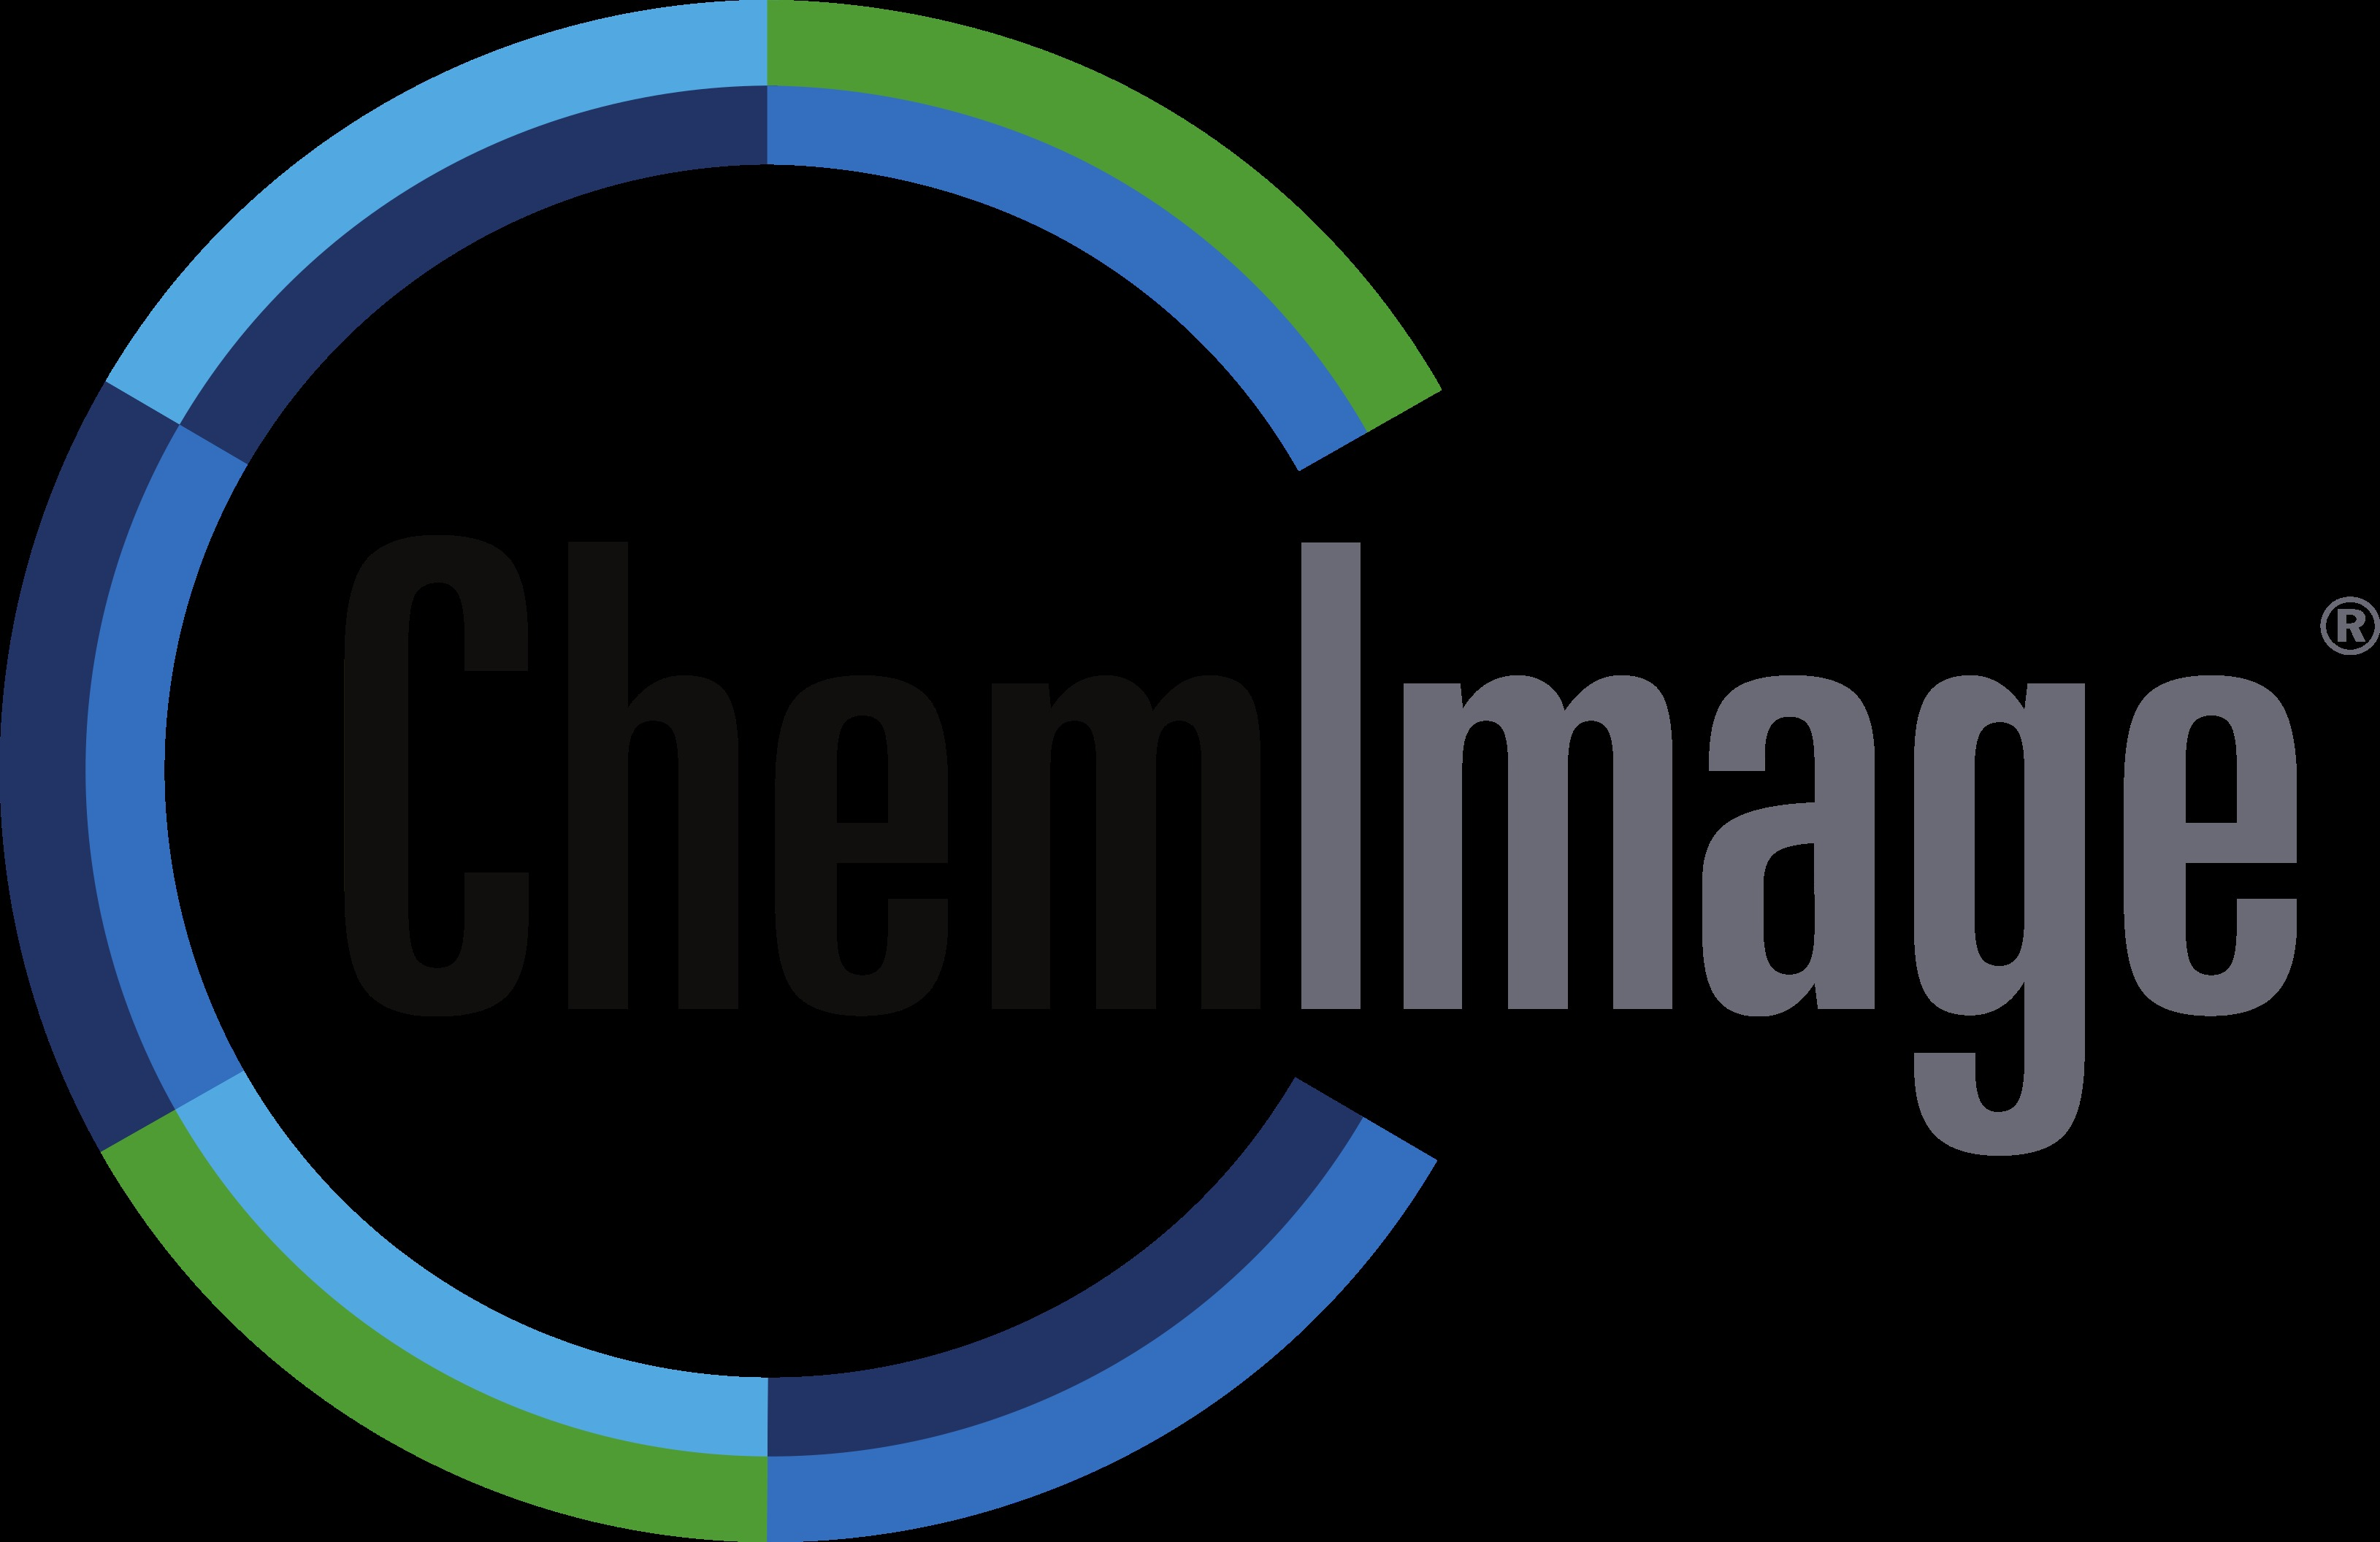 ChemImage